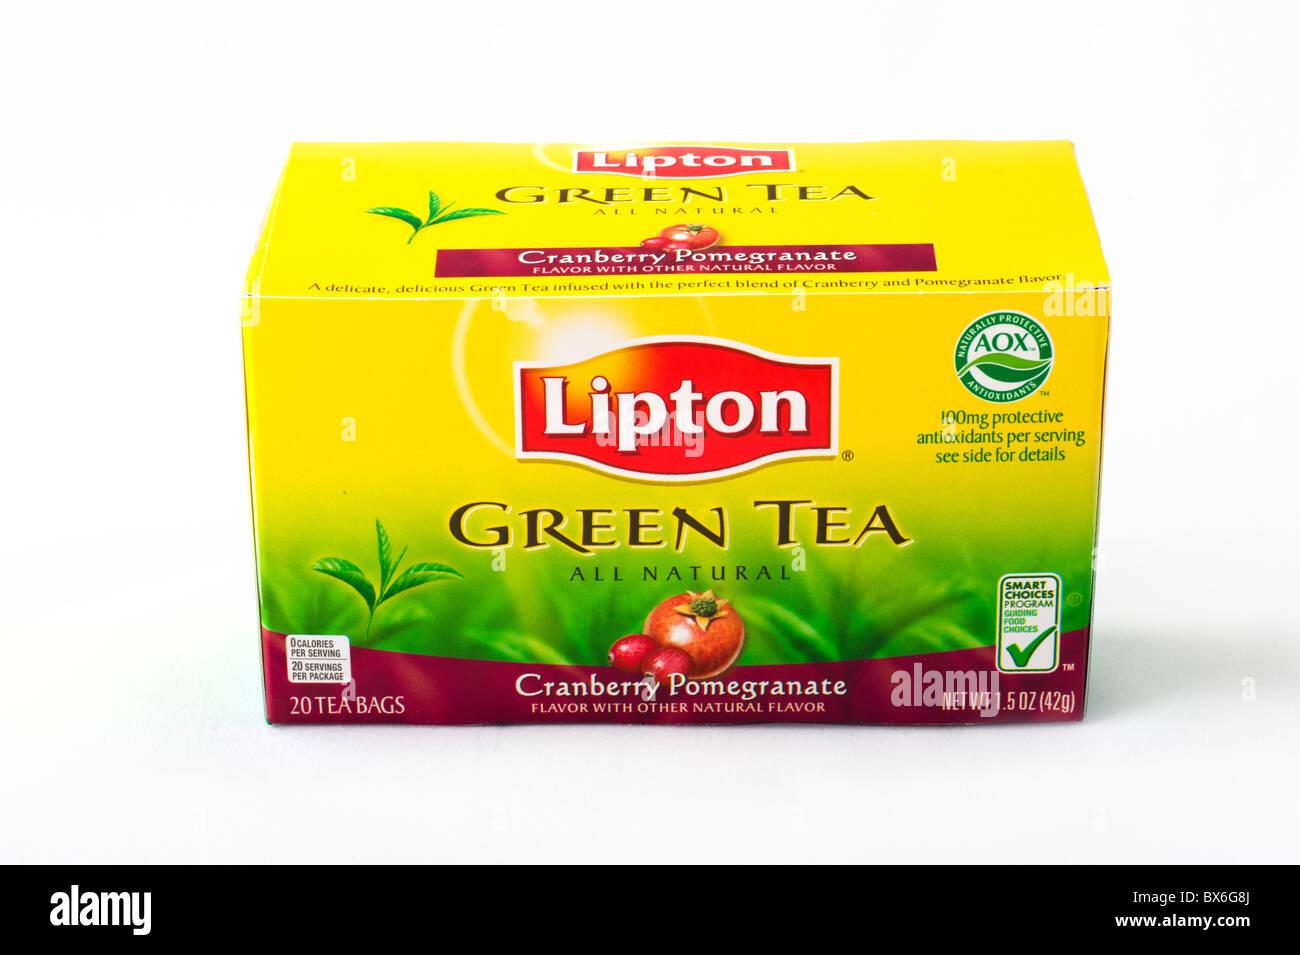 Box of Lipton Green Tea bags, USA - Stock Image